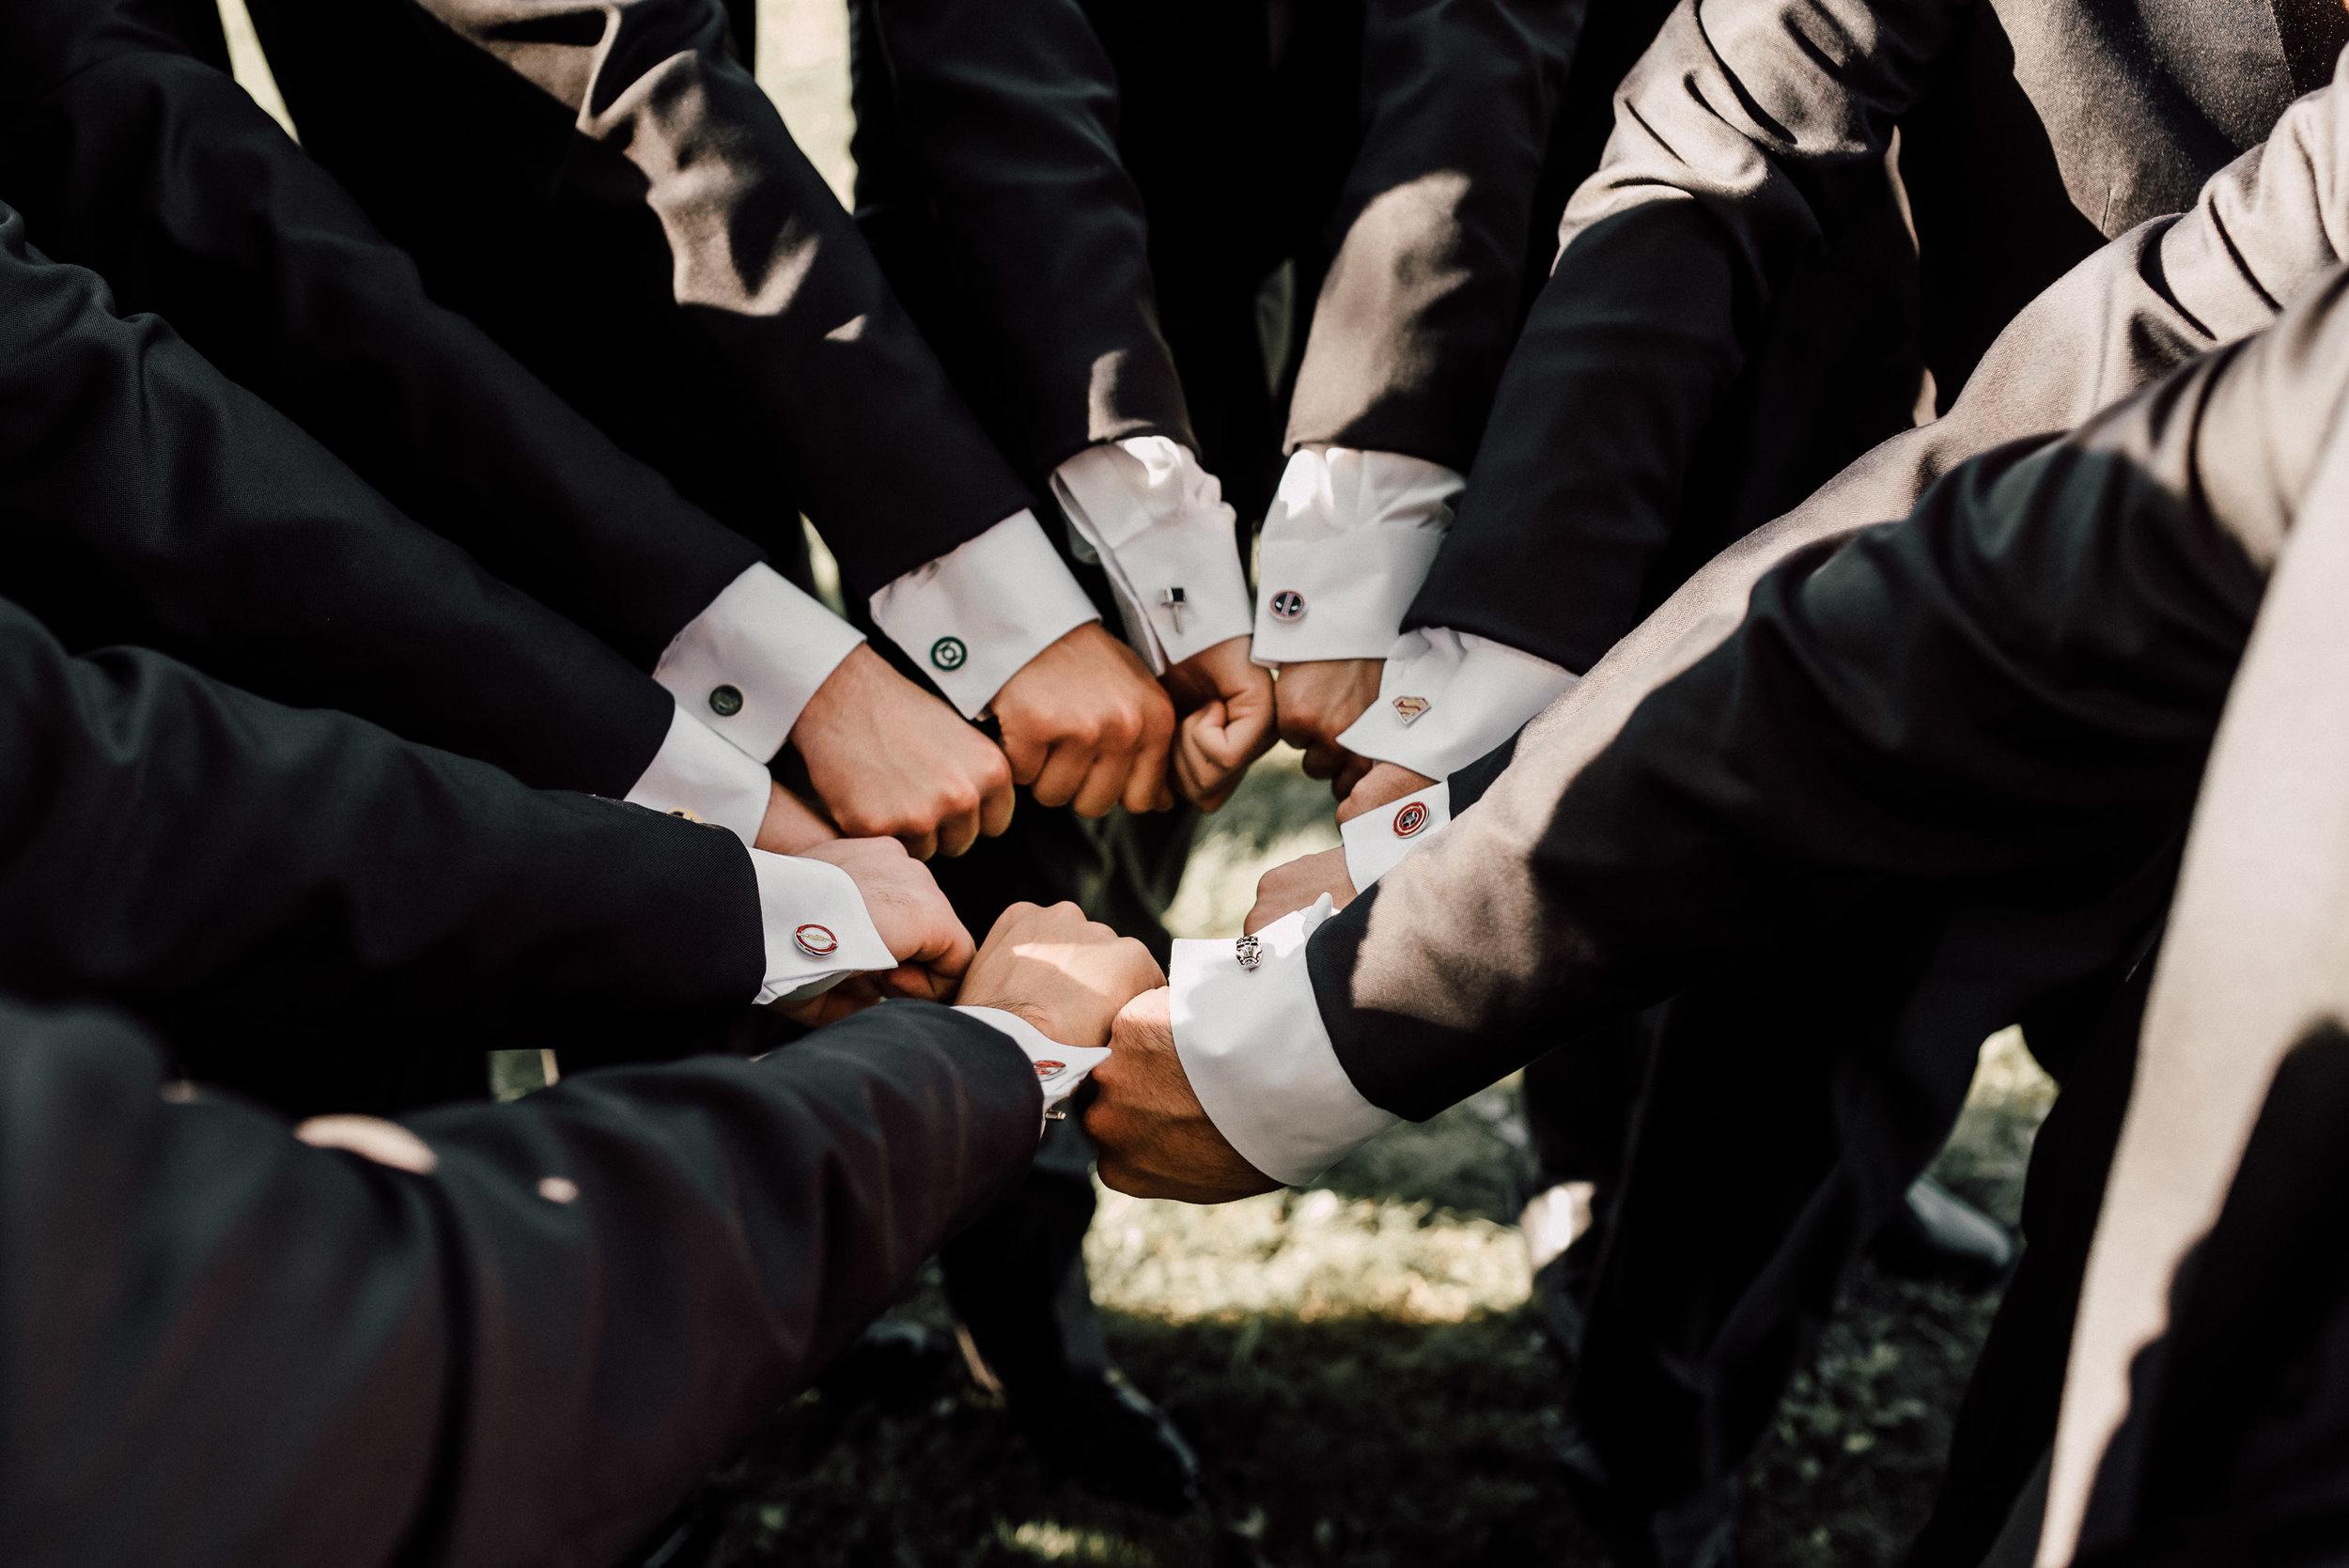 cufflink photos, wedding cufflinks